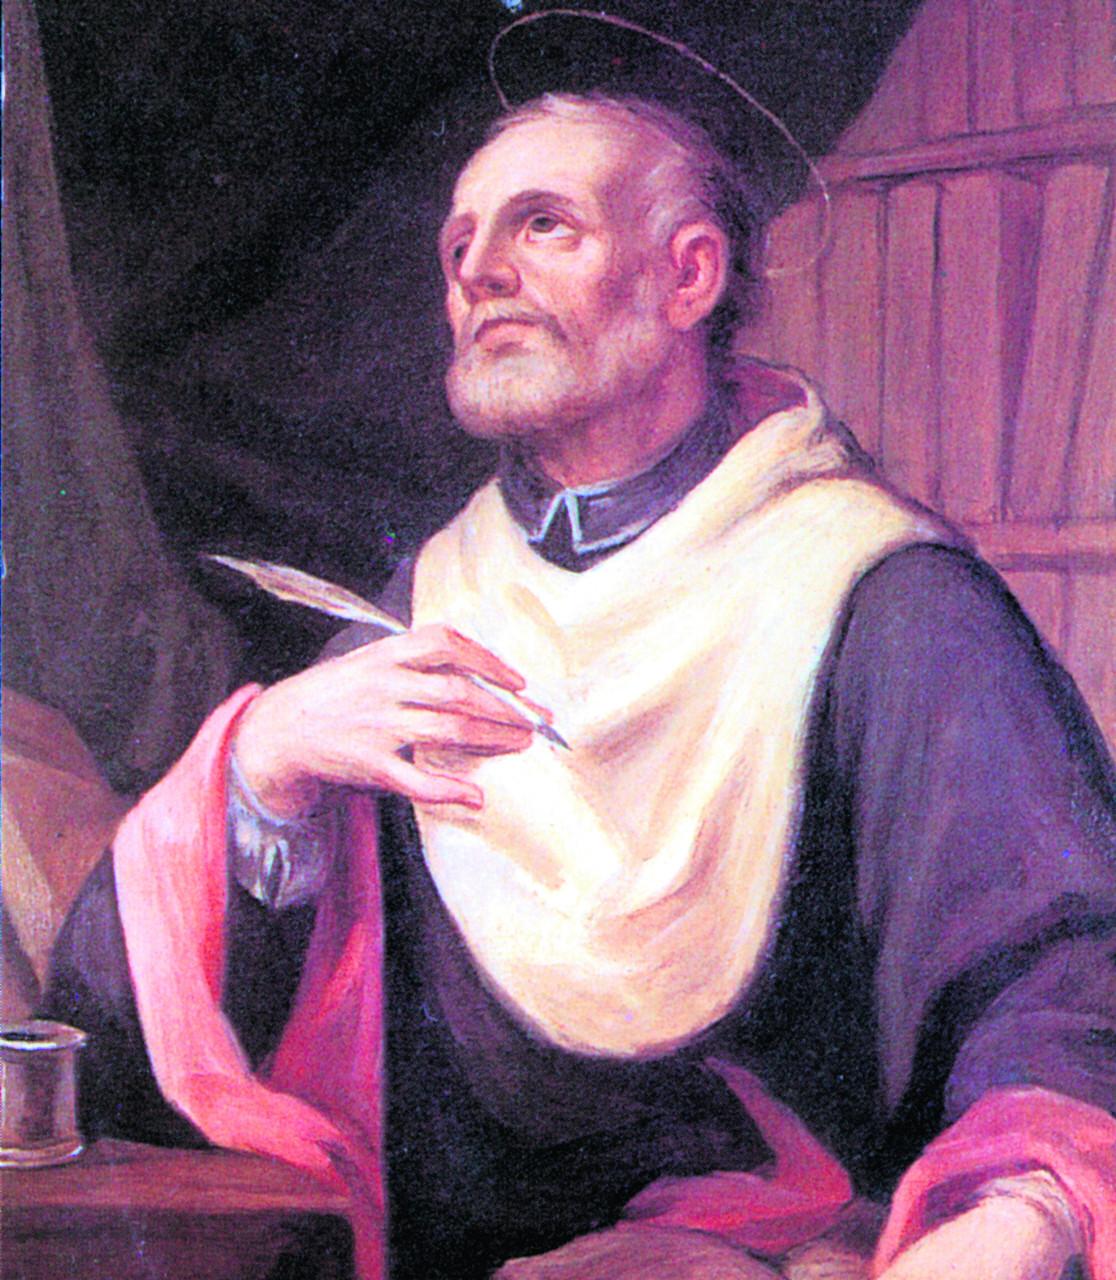 św. Jan Kanty, prezbiter